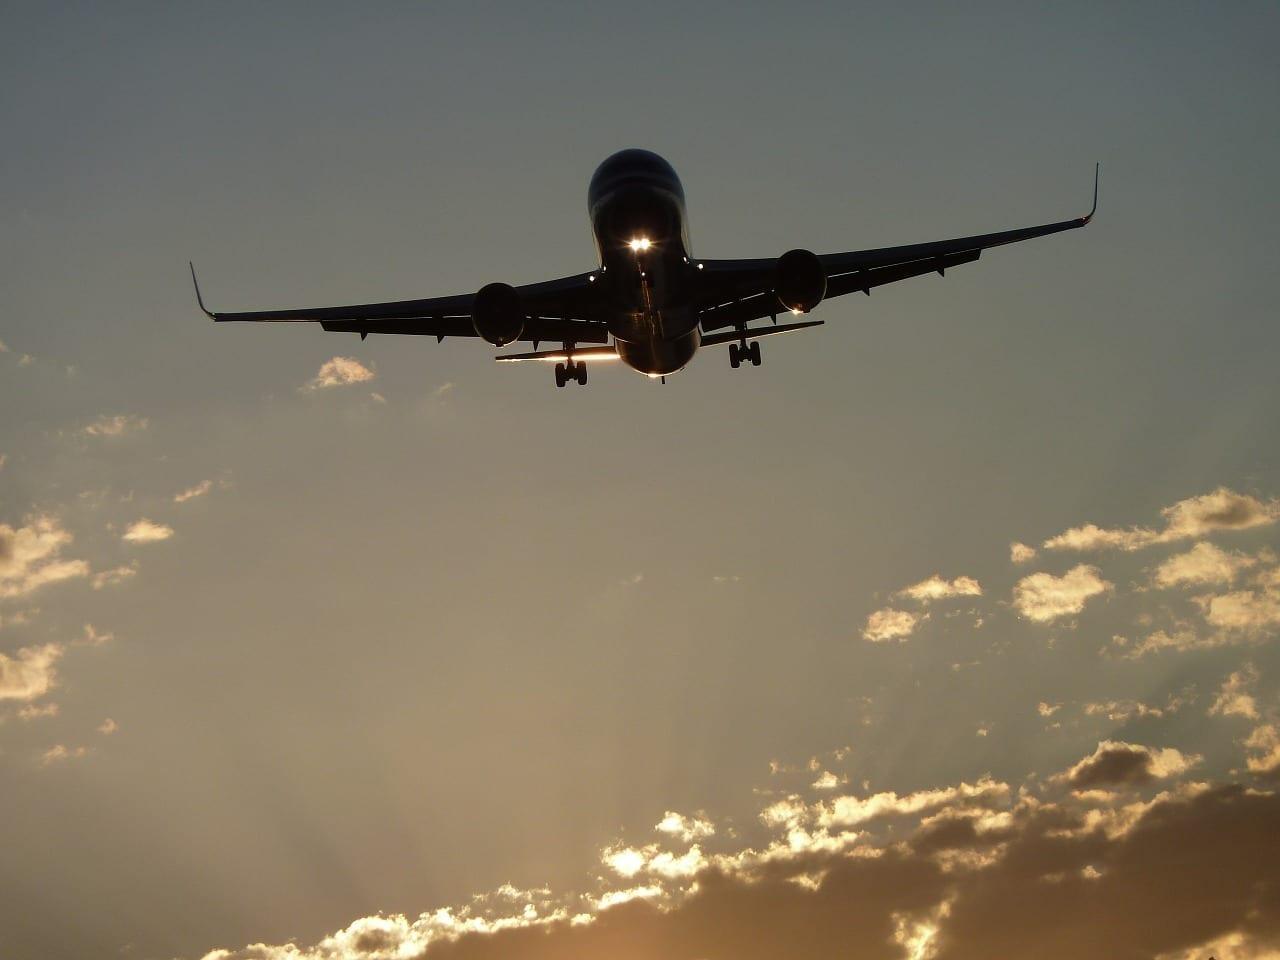 ᐅ Transfers Vom Flughafen London City Airport Lcy Nach London